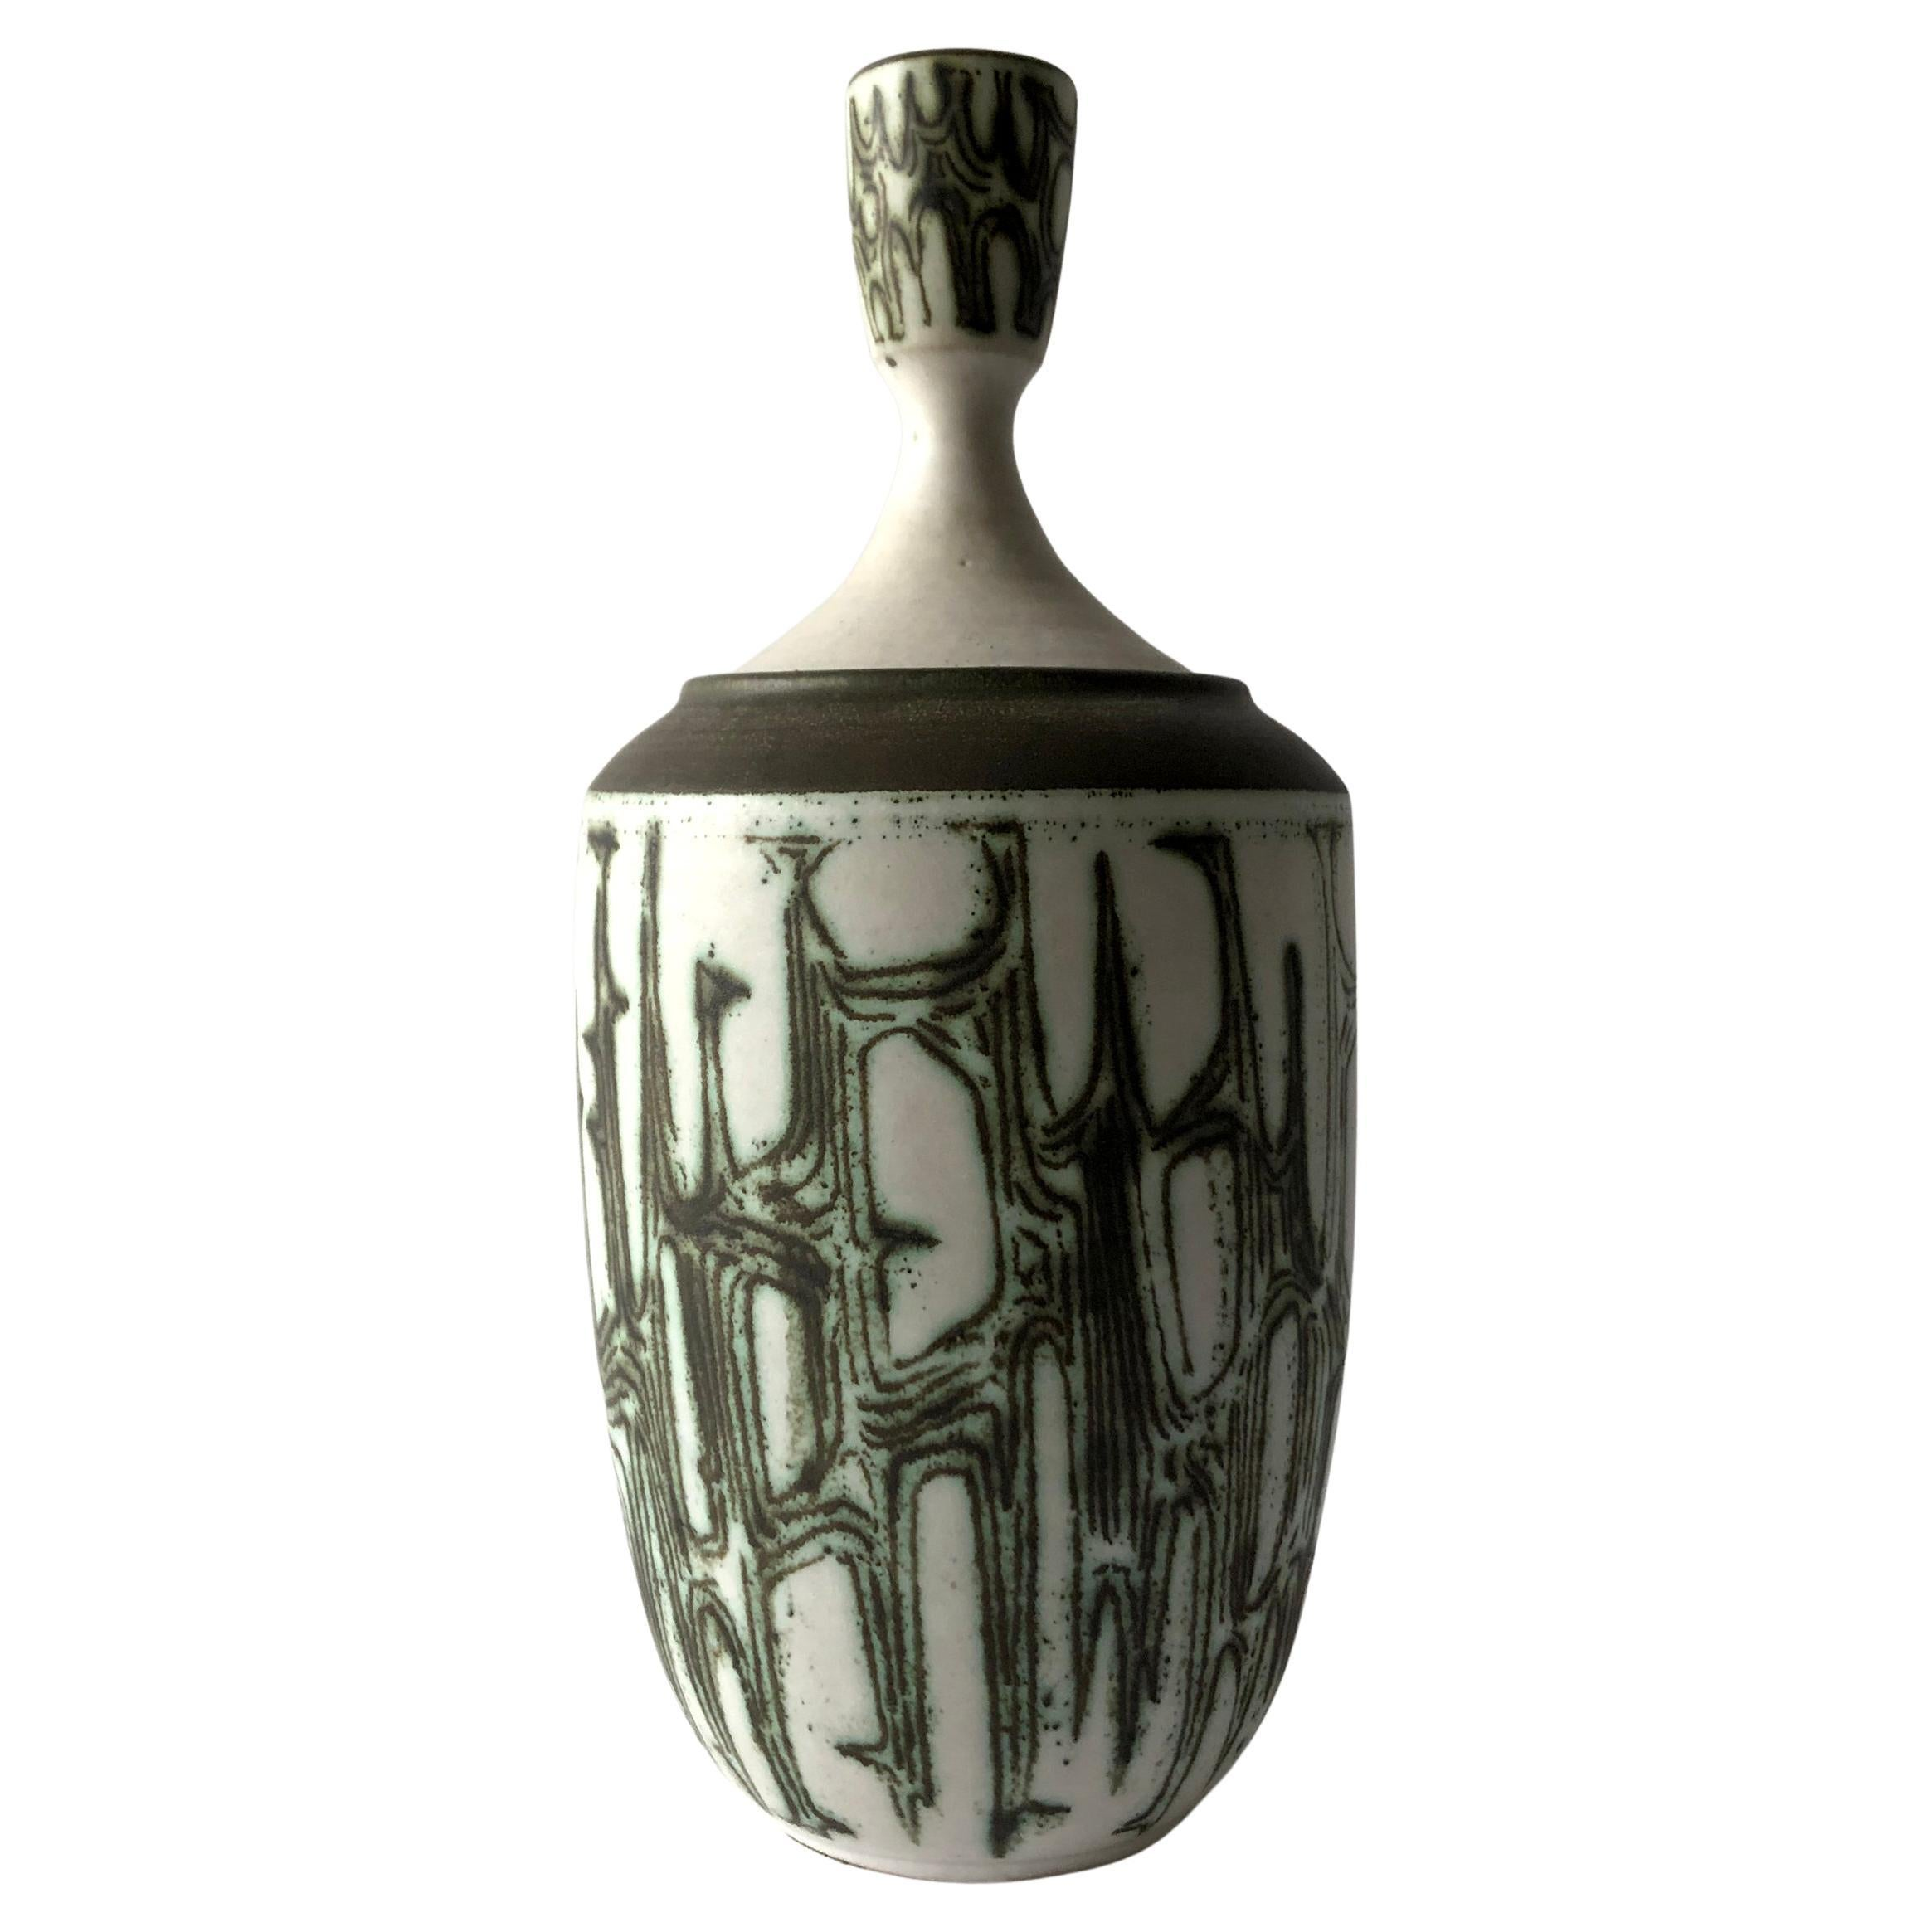 Holstrom Stoneware Modernist Studio Lidded Vessel